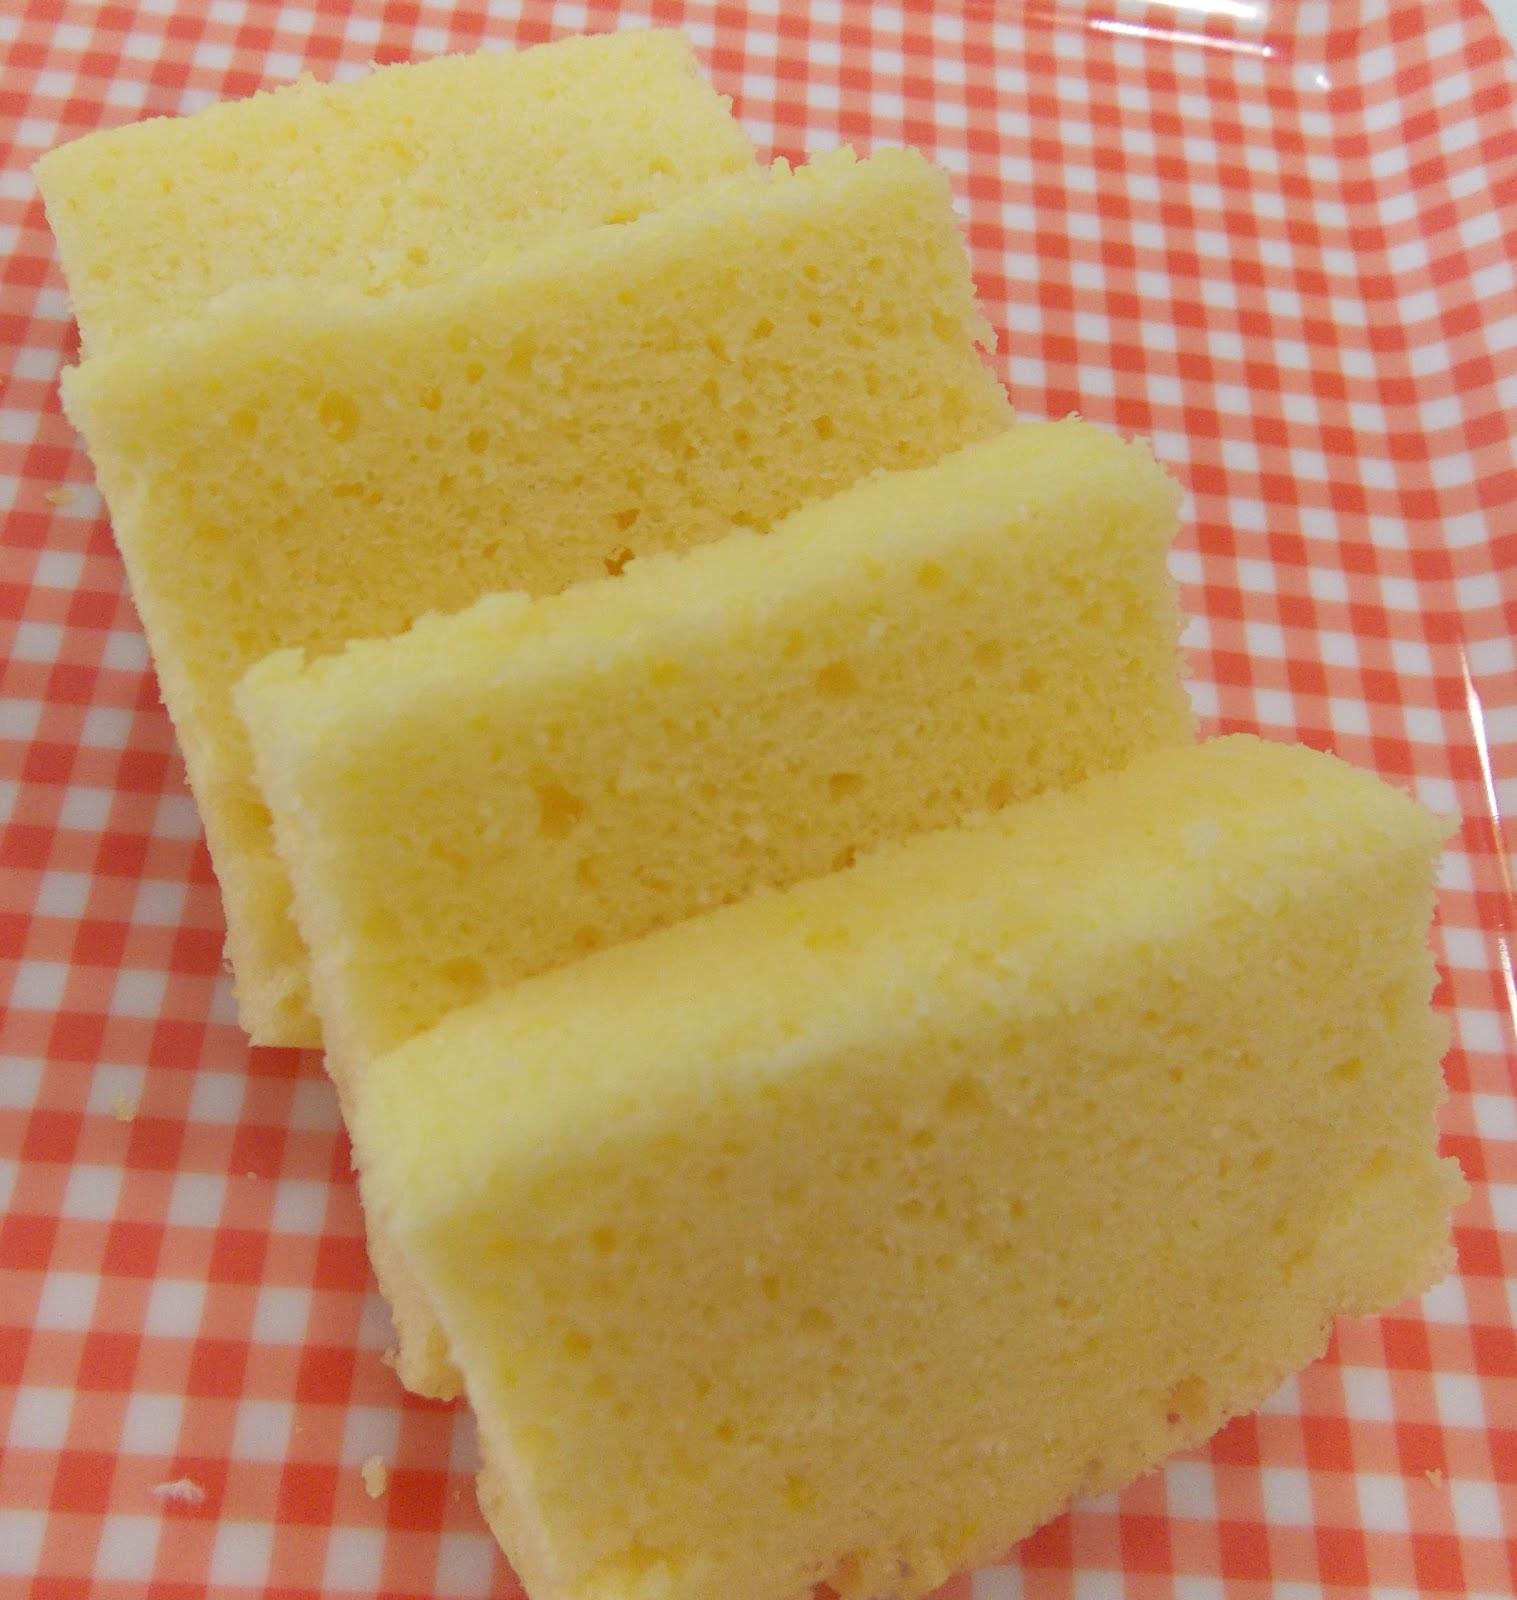 Taiwan Egg Sponge Cake Recipe